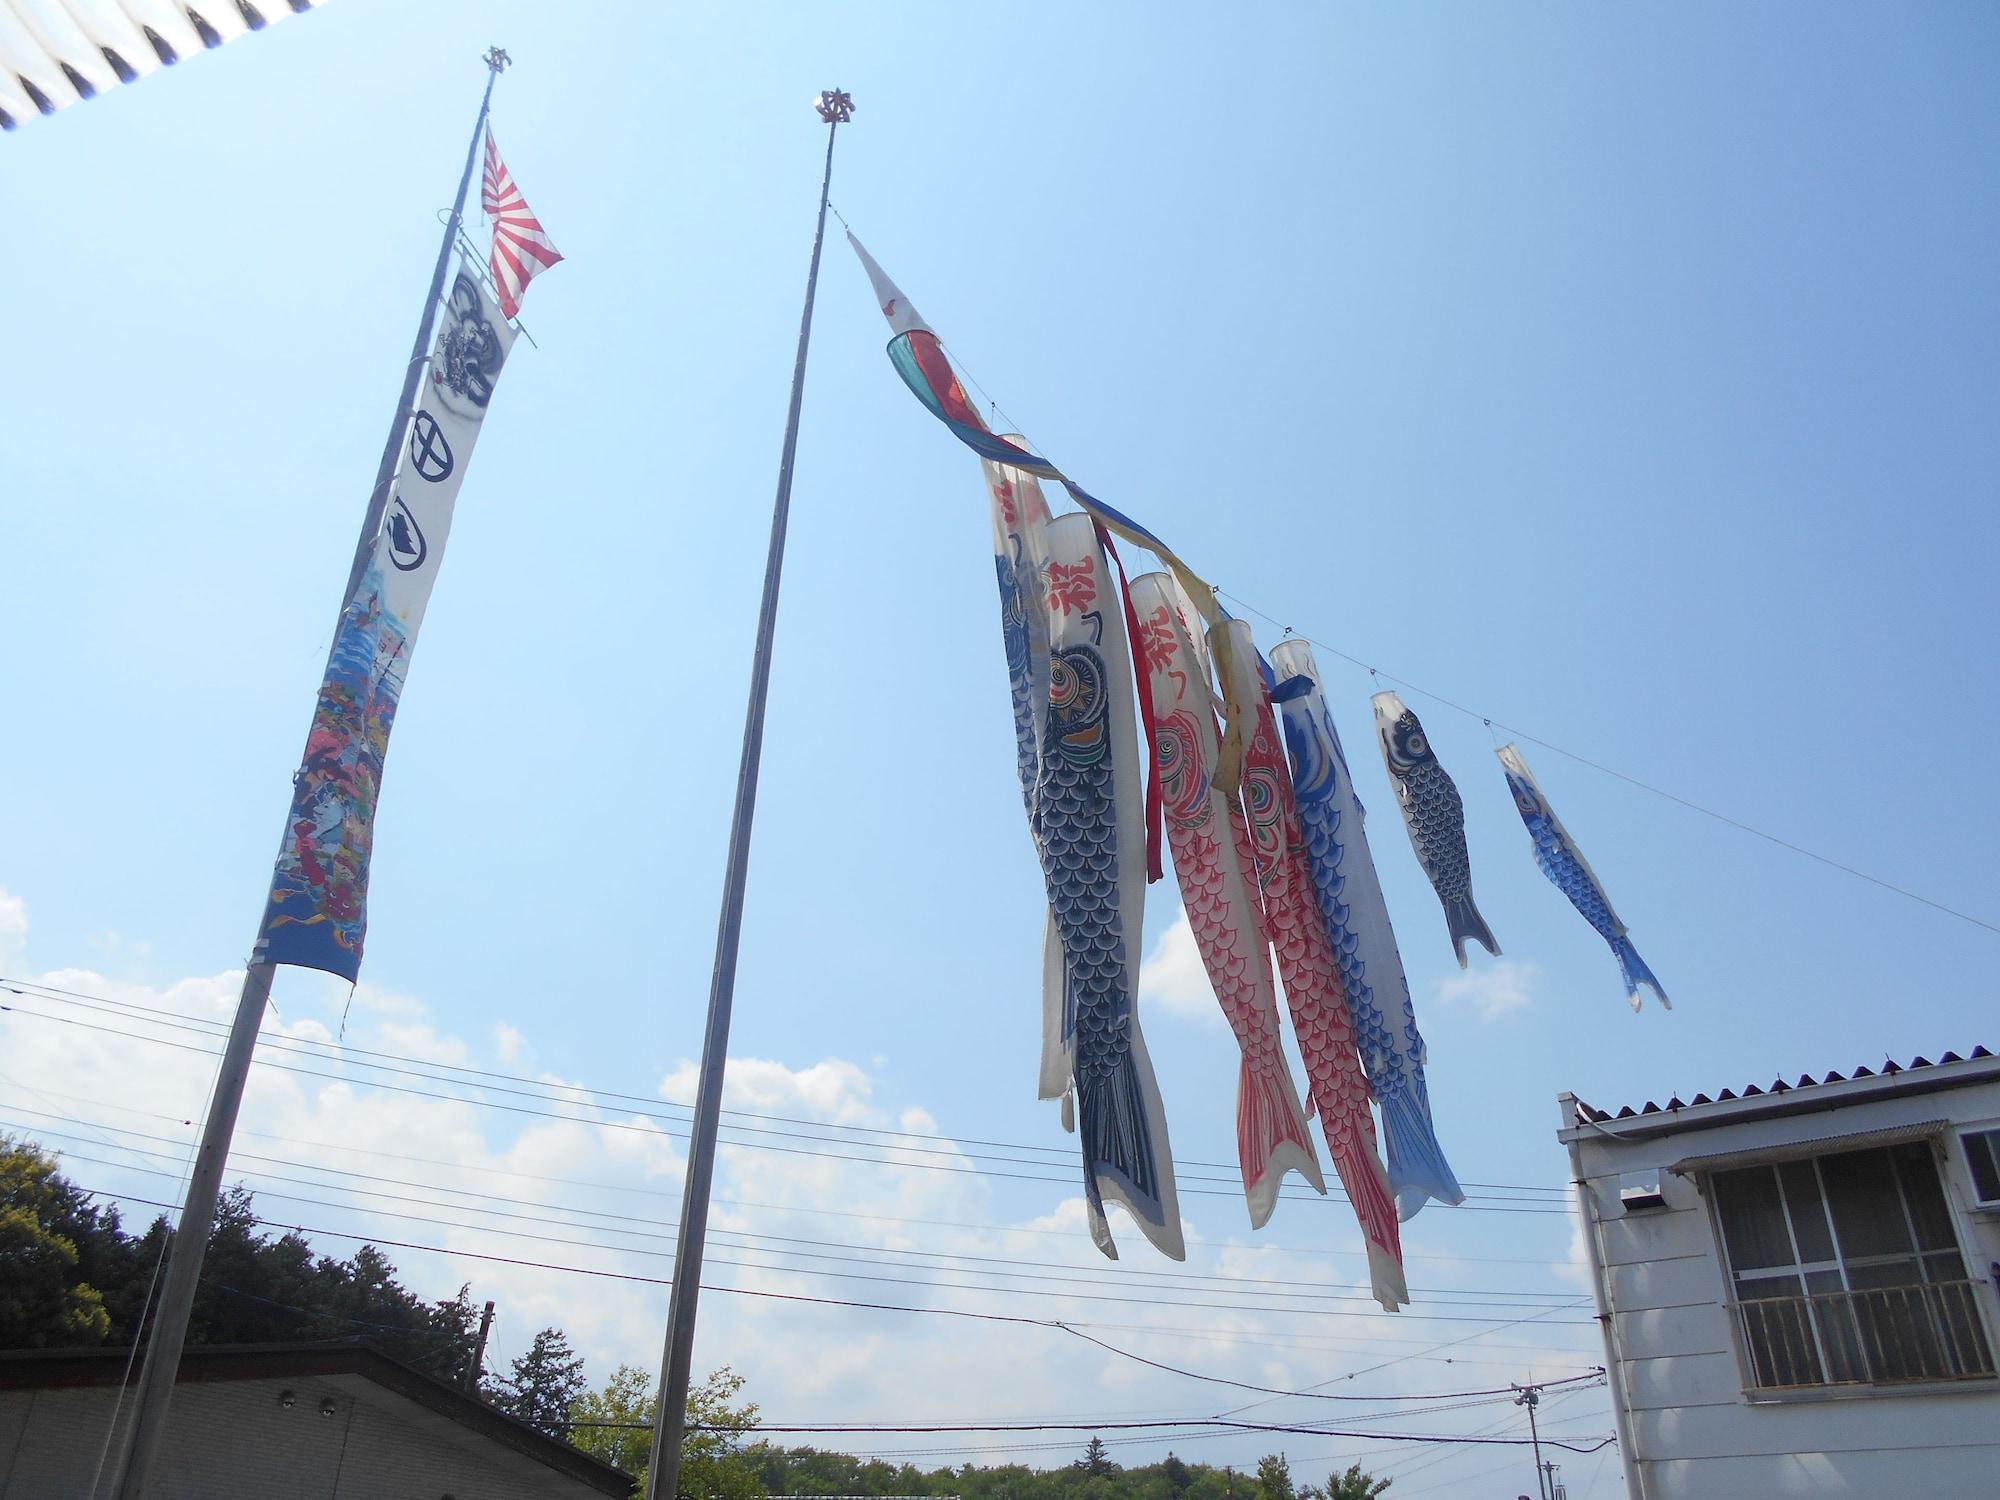 Guest House Nihon 1 Shuu - Hostel, Chichibu